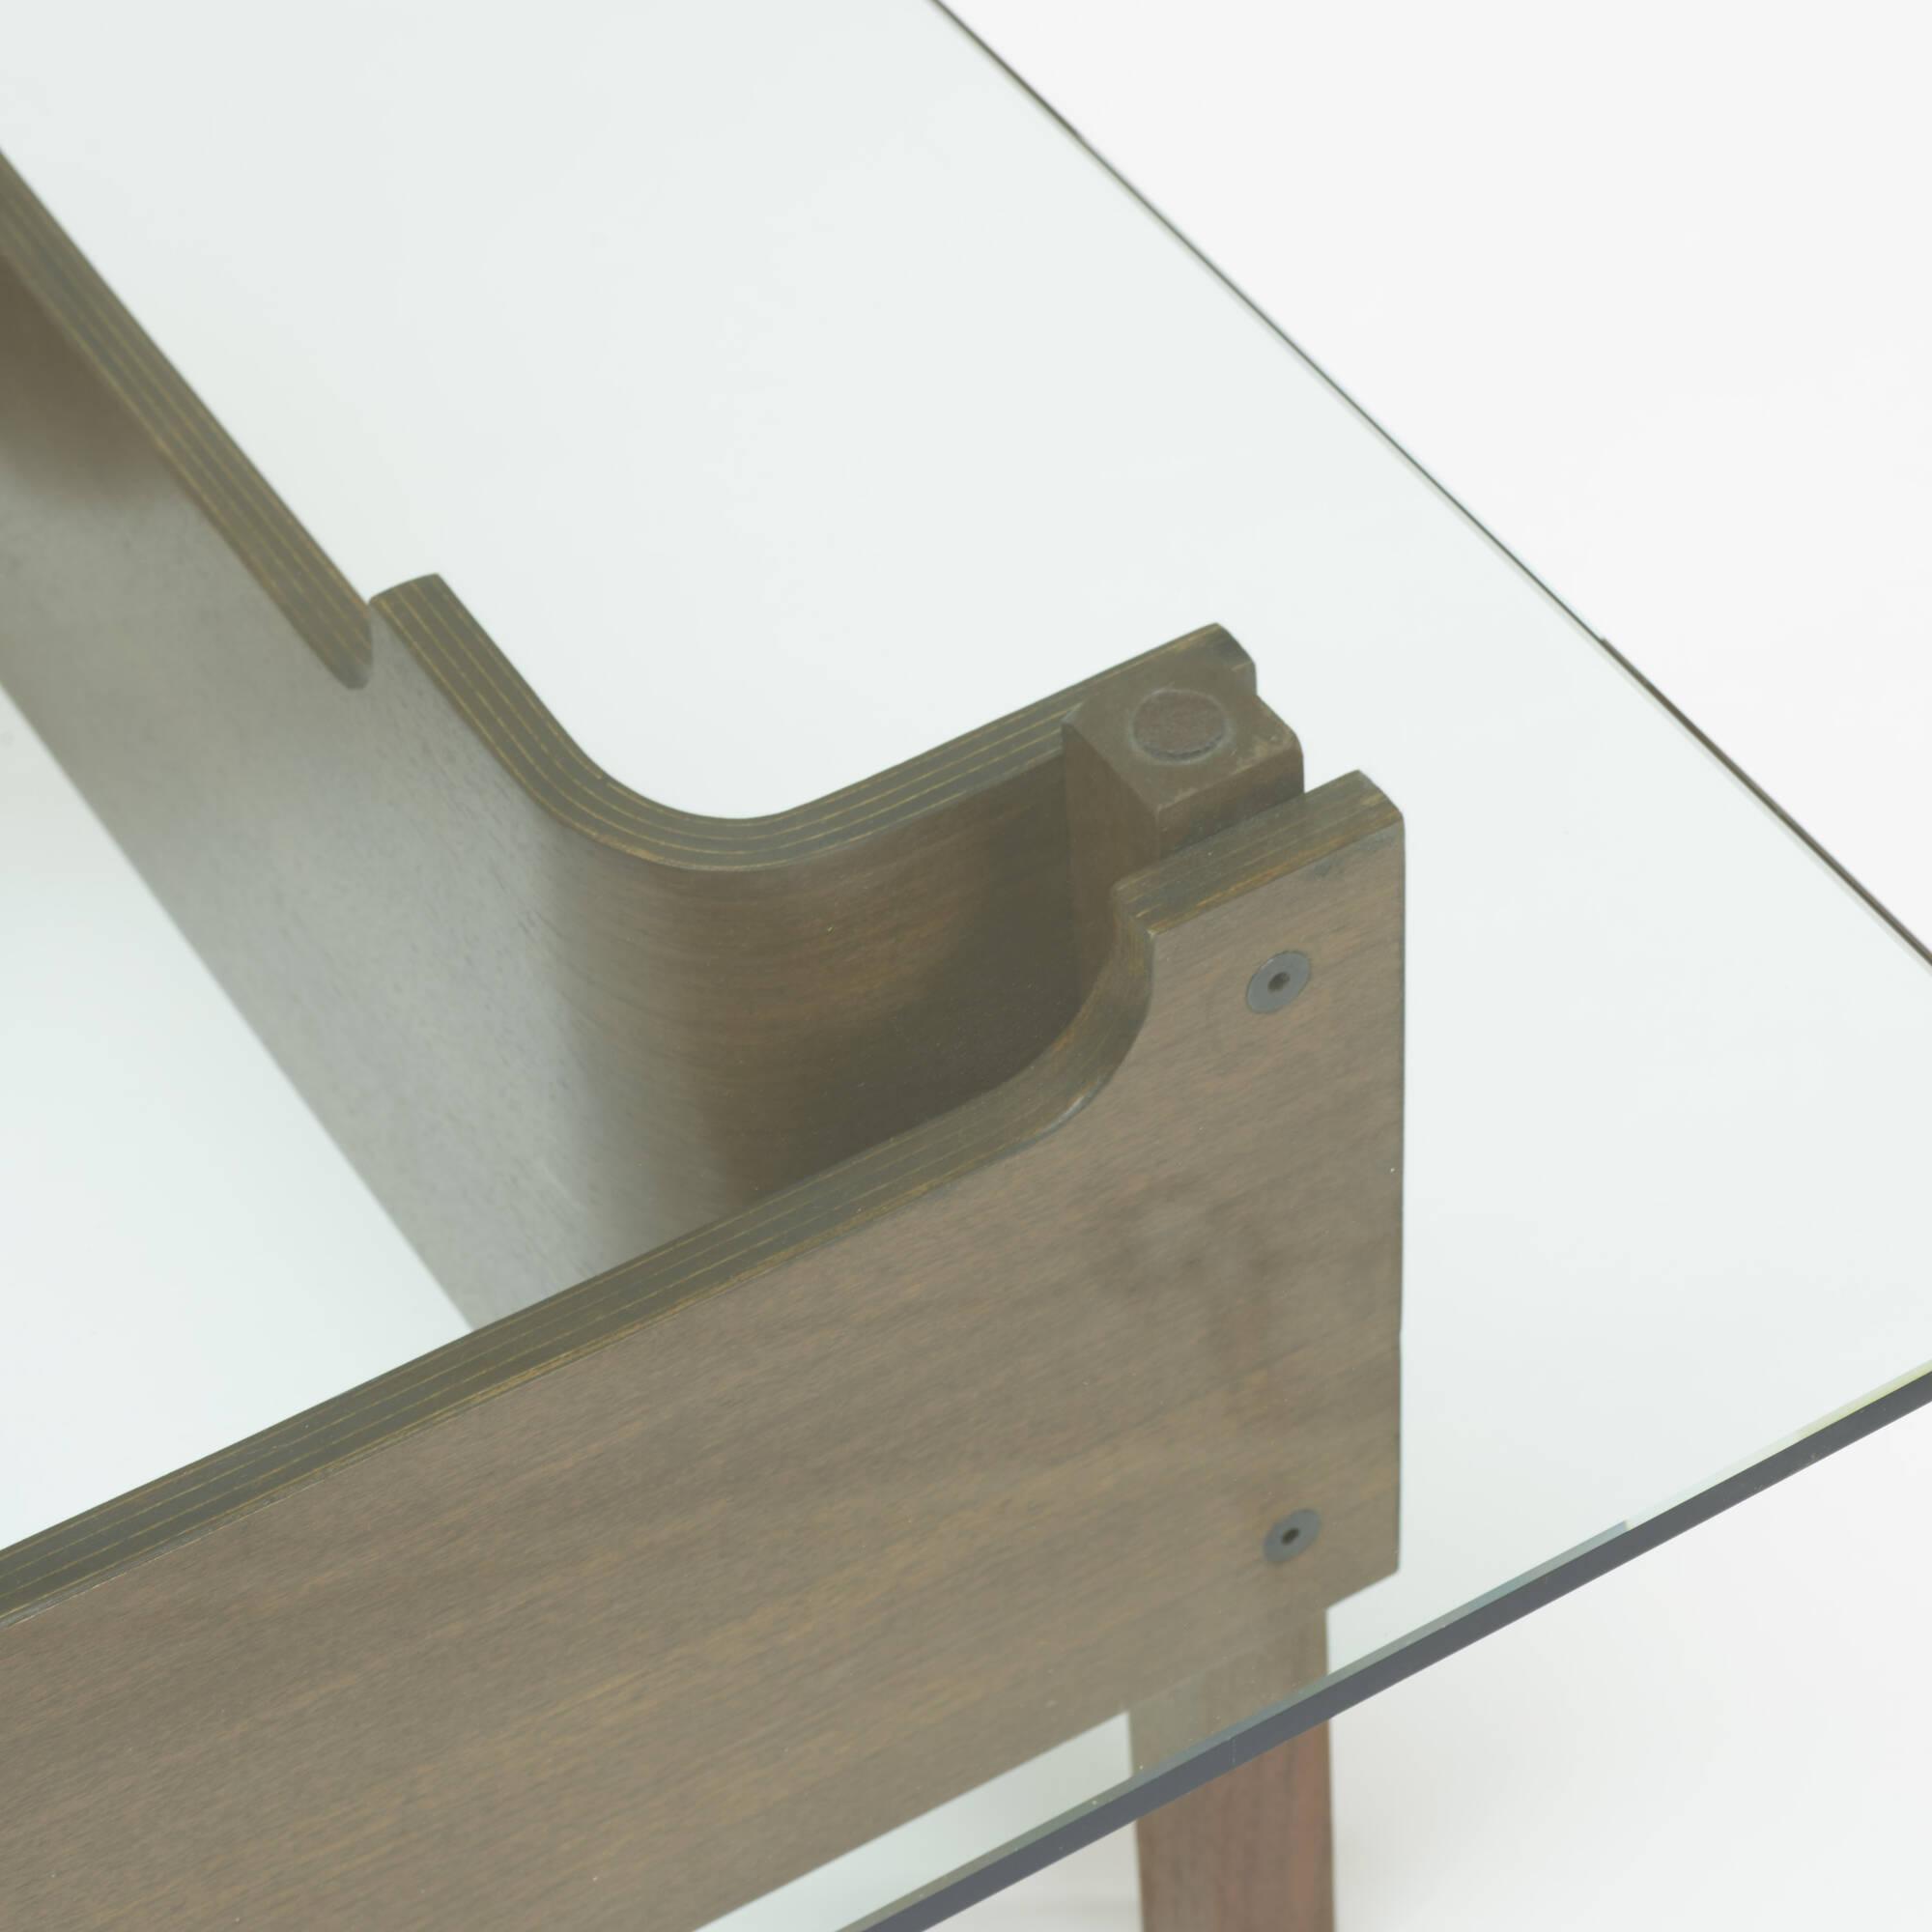 429: Paolo Portoghesi / Levogiro coffee table (2 of 2)